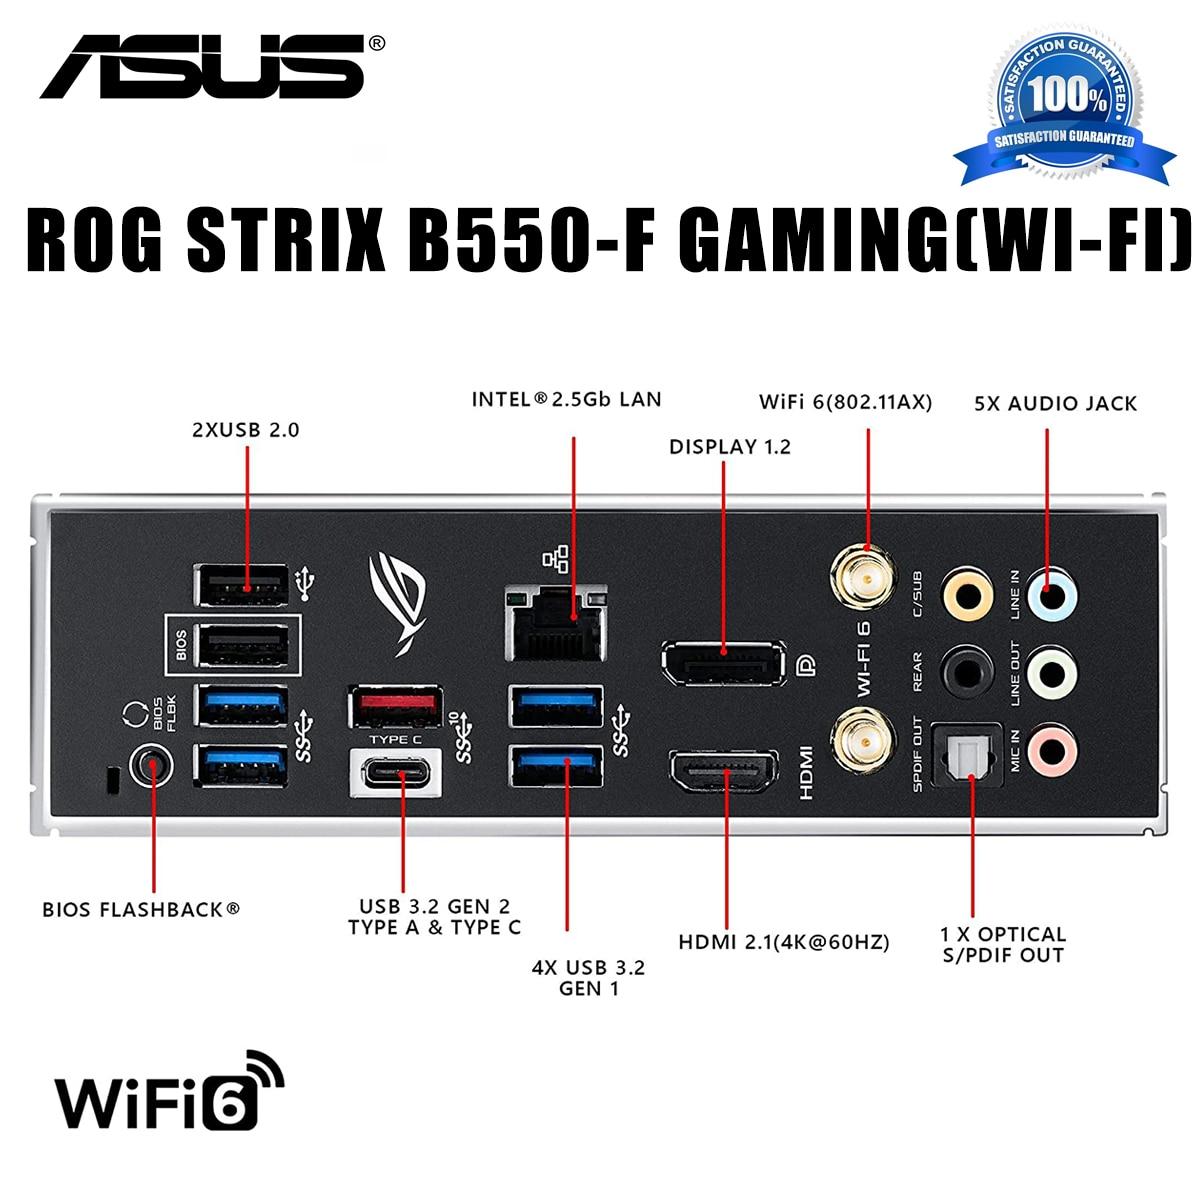 Socket AM4 Asus ROG STRIX B550-F GAMING (WI-FI) Motherboard Support 3500X 3600 AM4 CPU DDR4 Overlocking B550 Gaming Placa-mãe